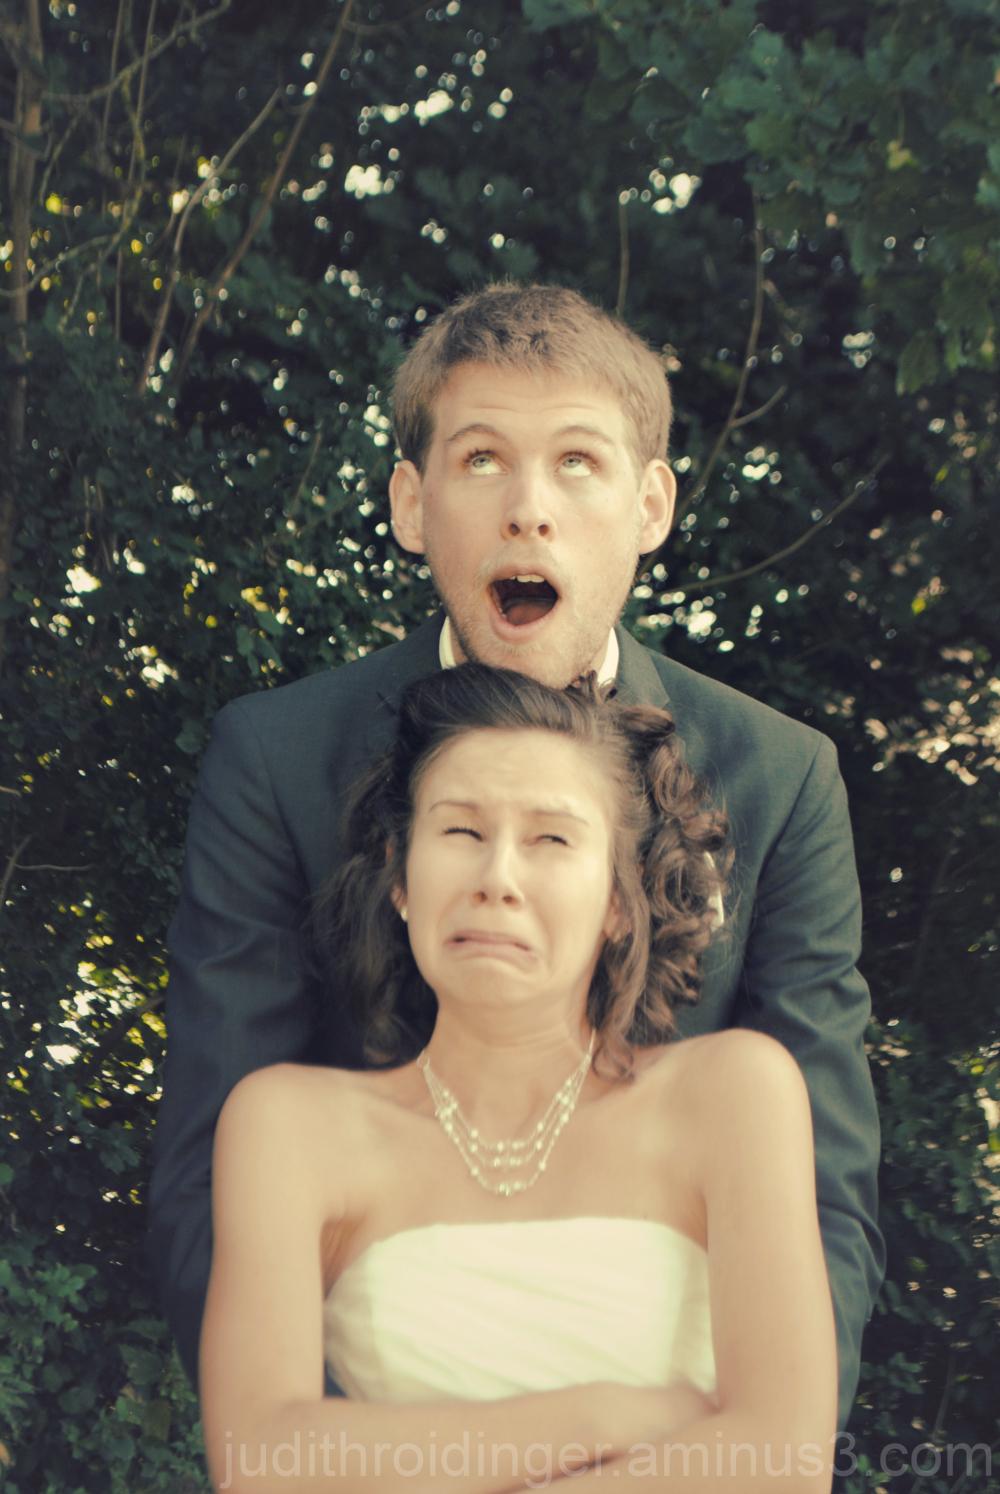 funny newlyweds